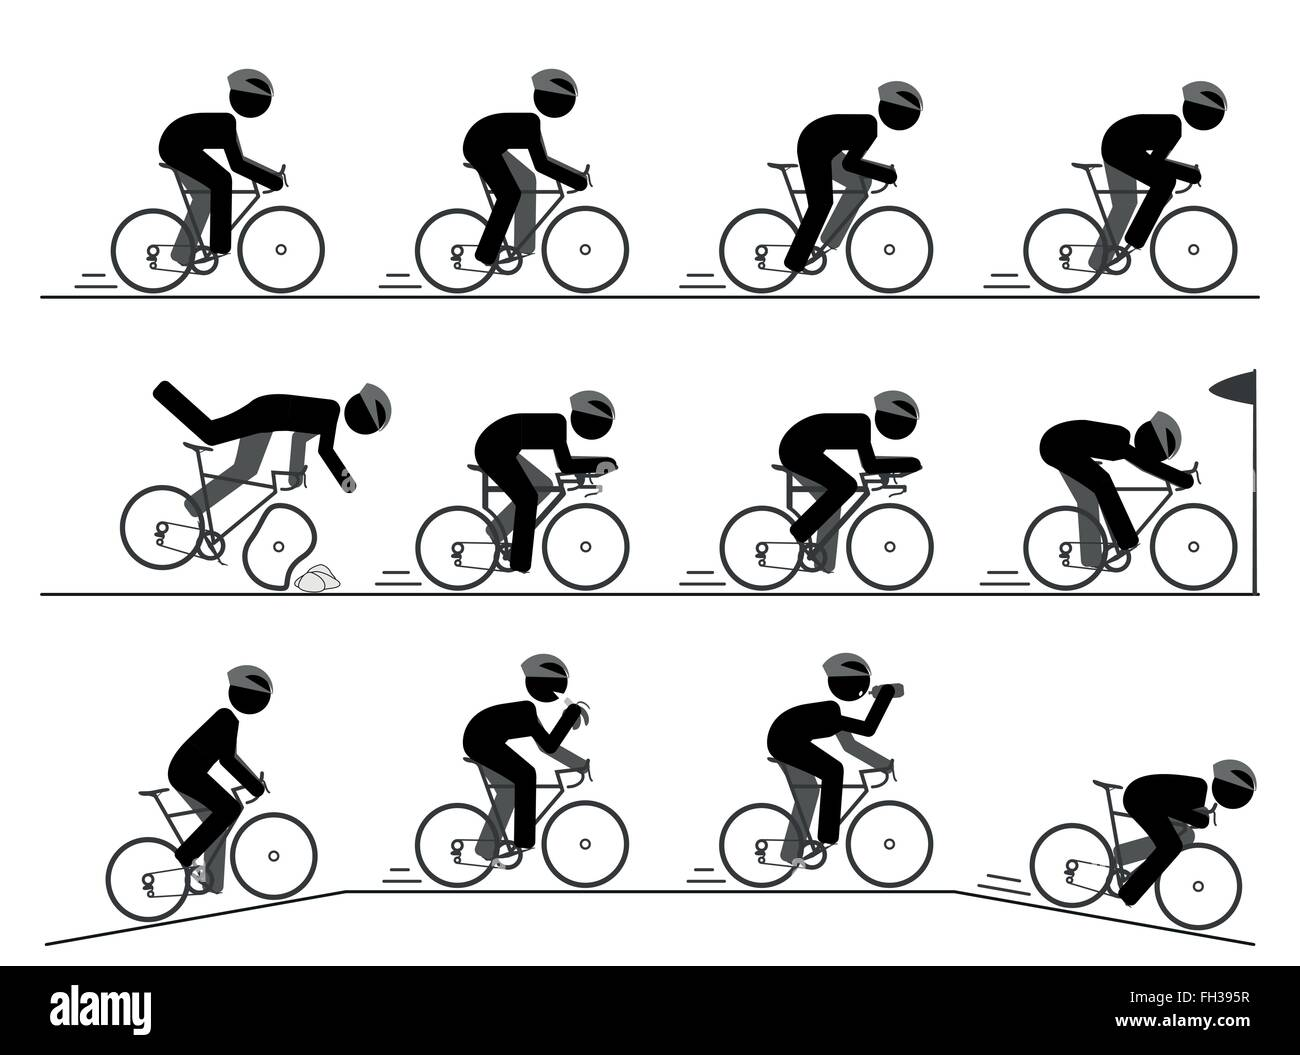 Fahrrad-Rennen-Piktogramm Stockbild